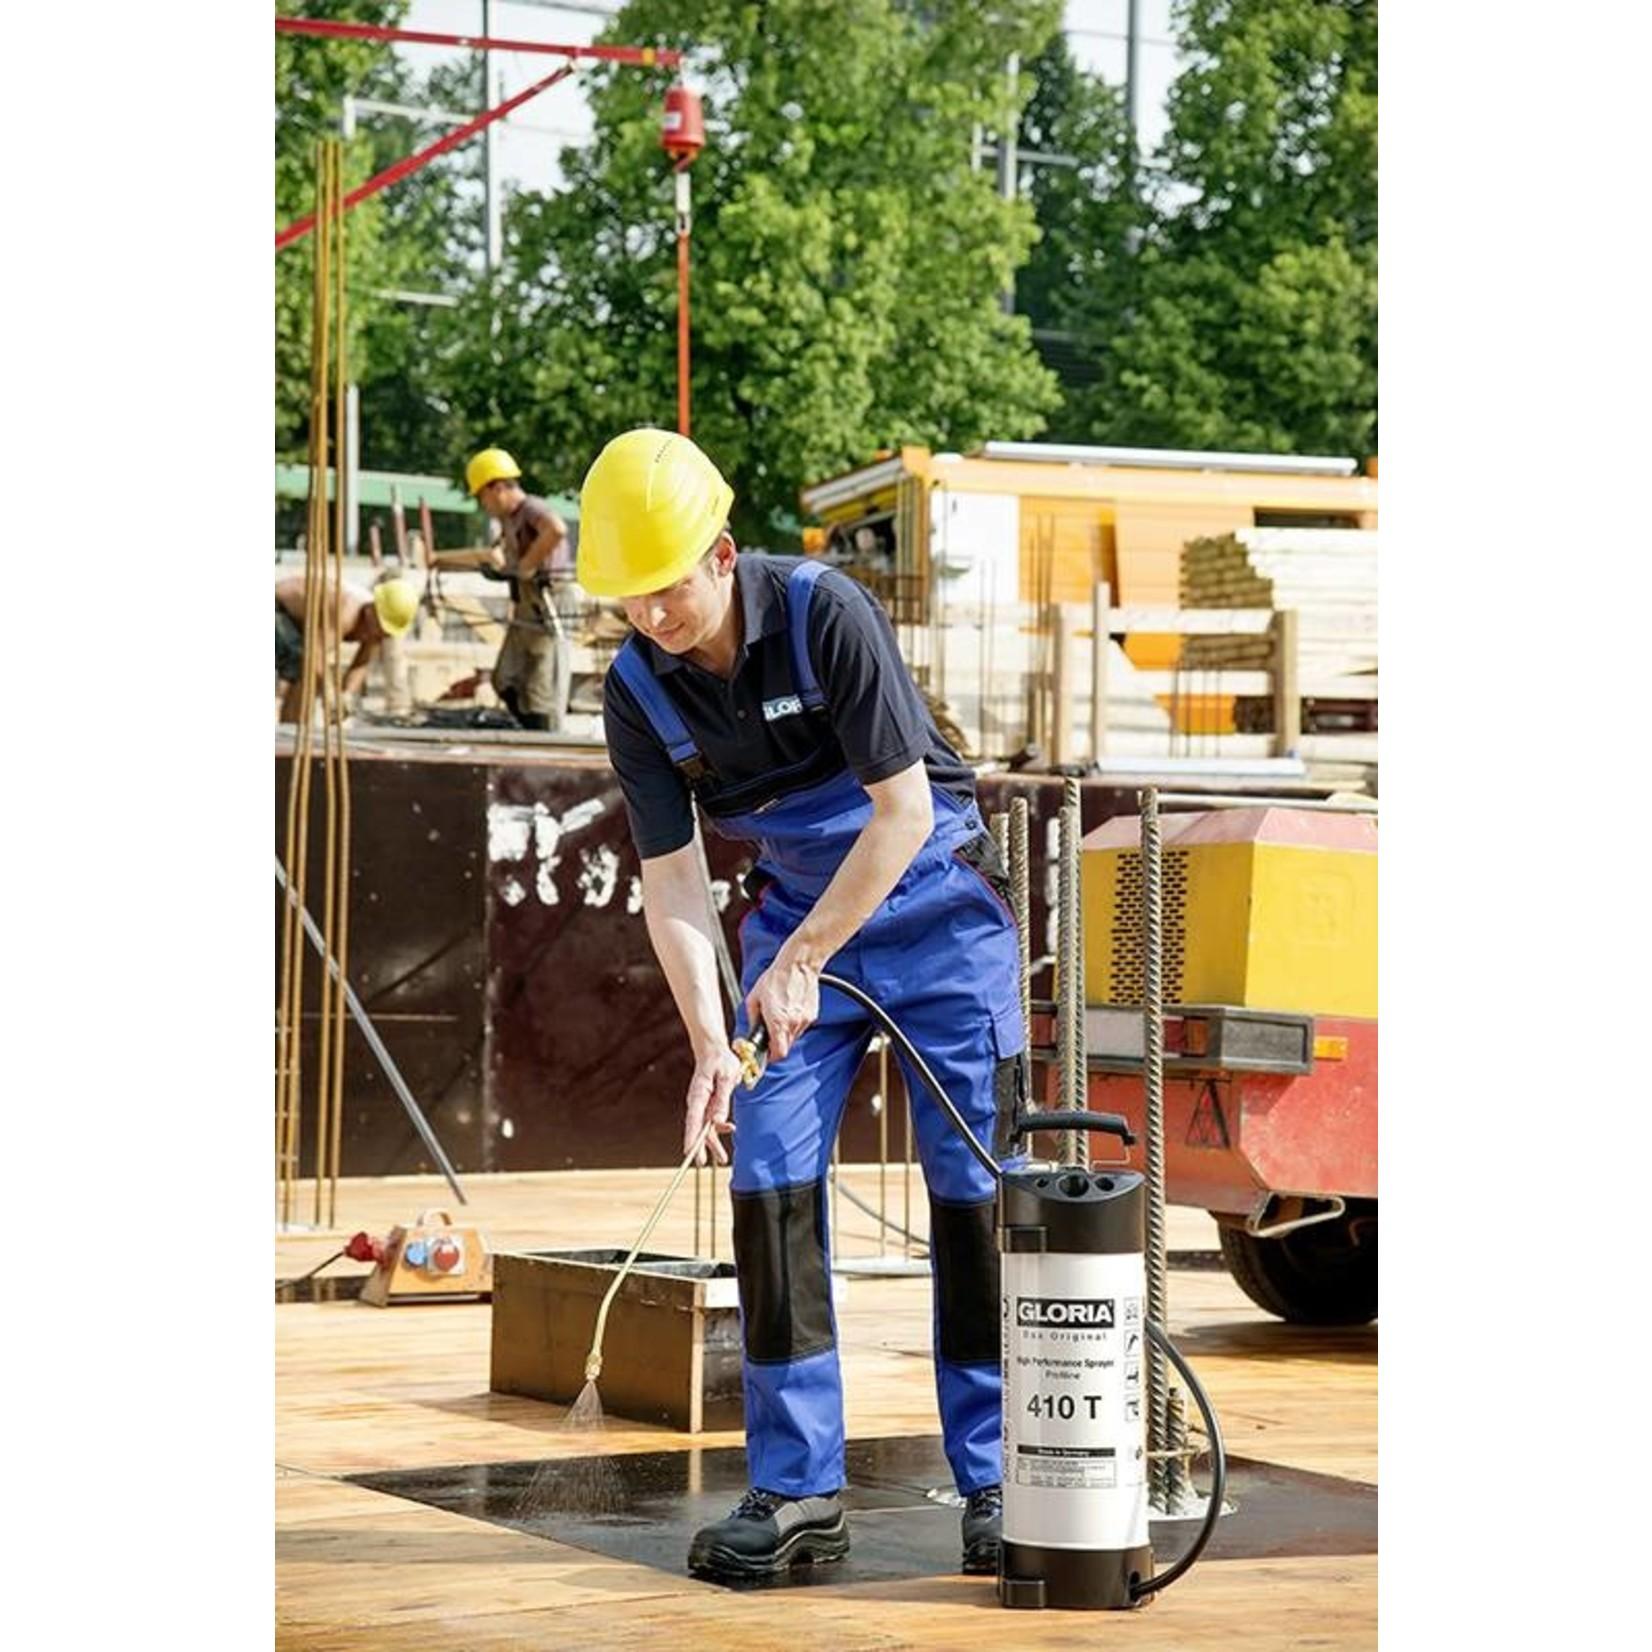 Gloria Industrie Hogedrukspuit Staal 410T Profiline (10 liter)